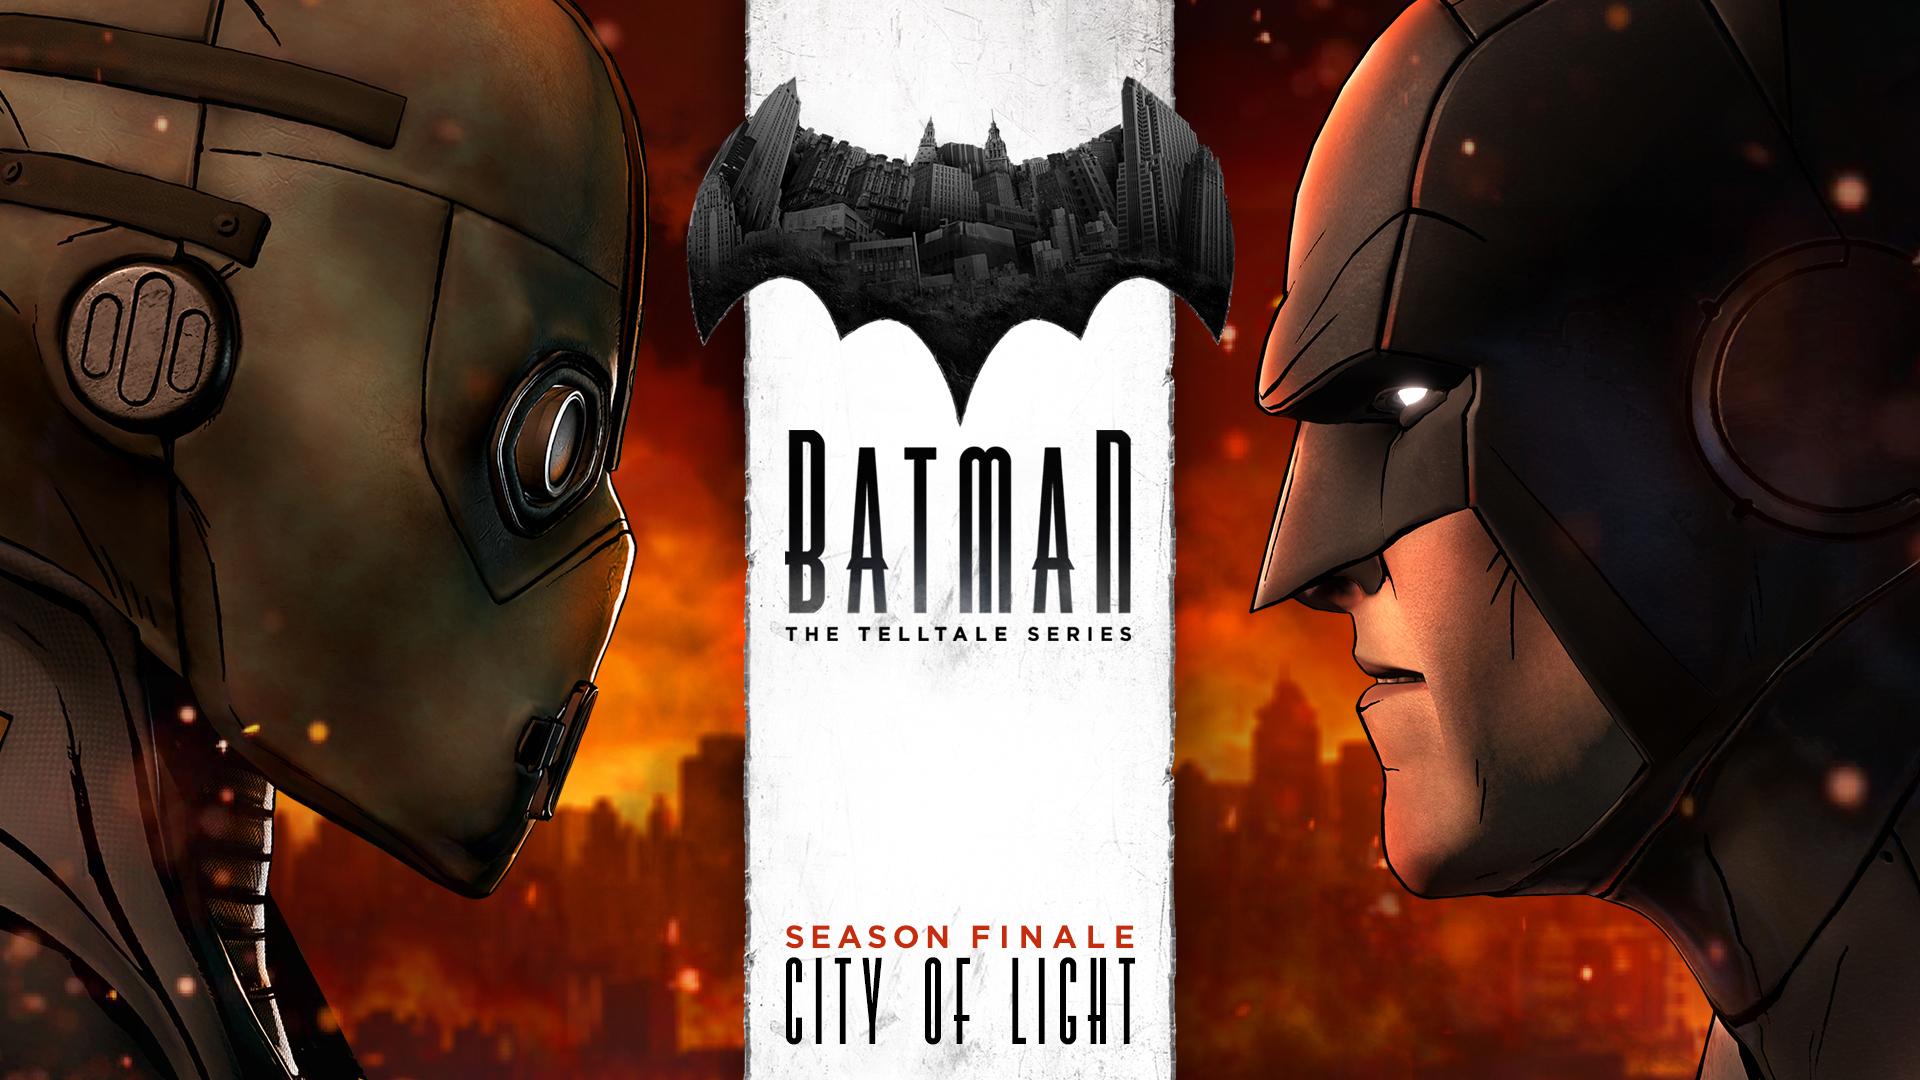 Batman: The Telltale Series Episode 5 review – City Of Light